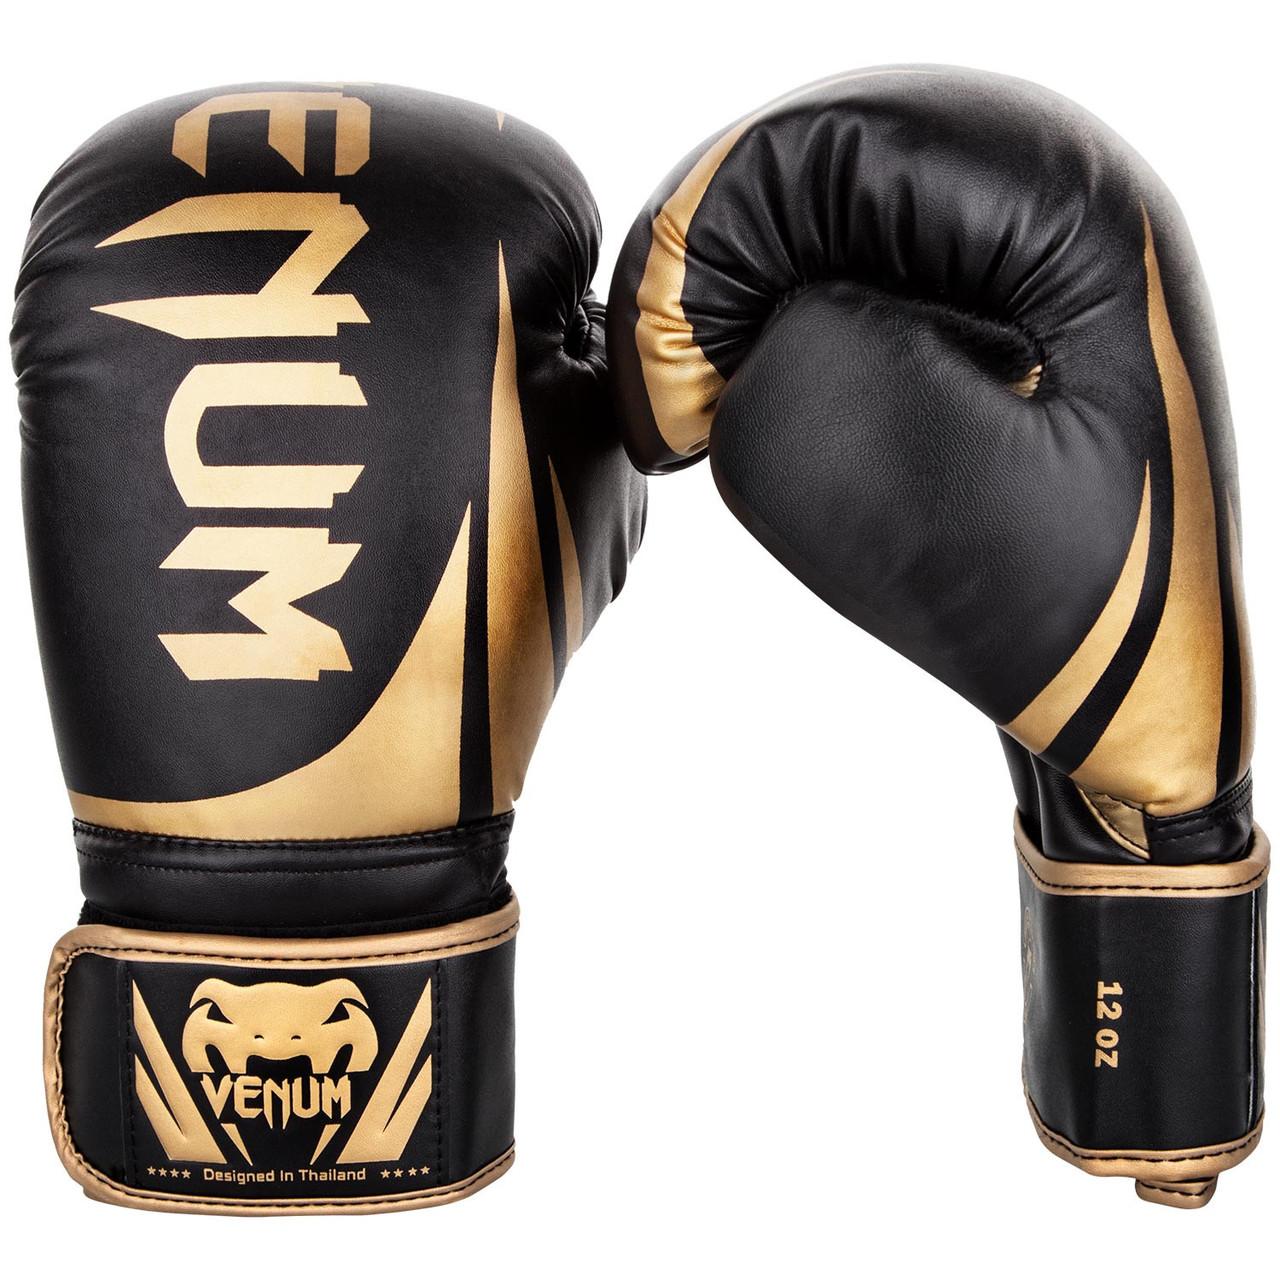 Перчатки боксерские Venum Challenger 2.0 Black/Gold 10oz